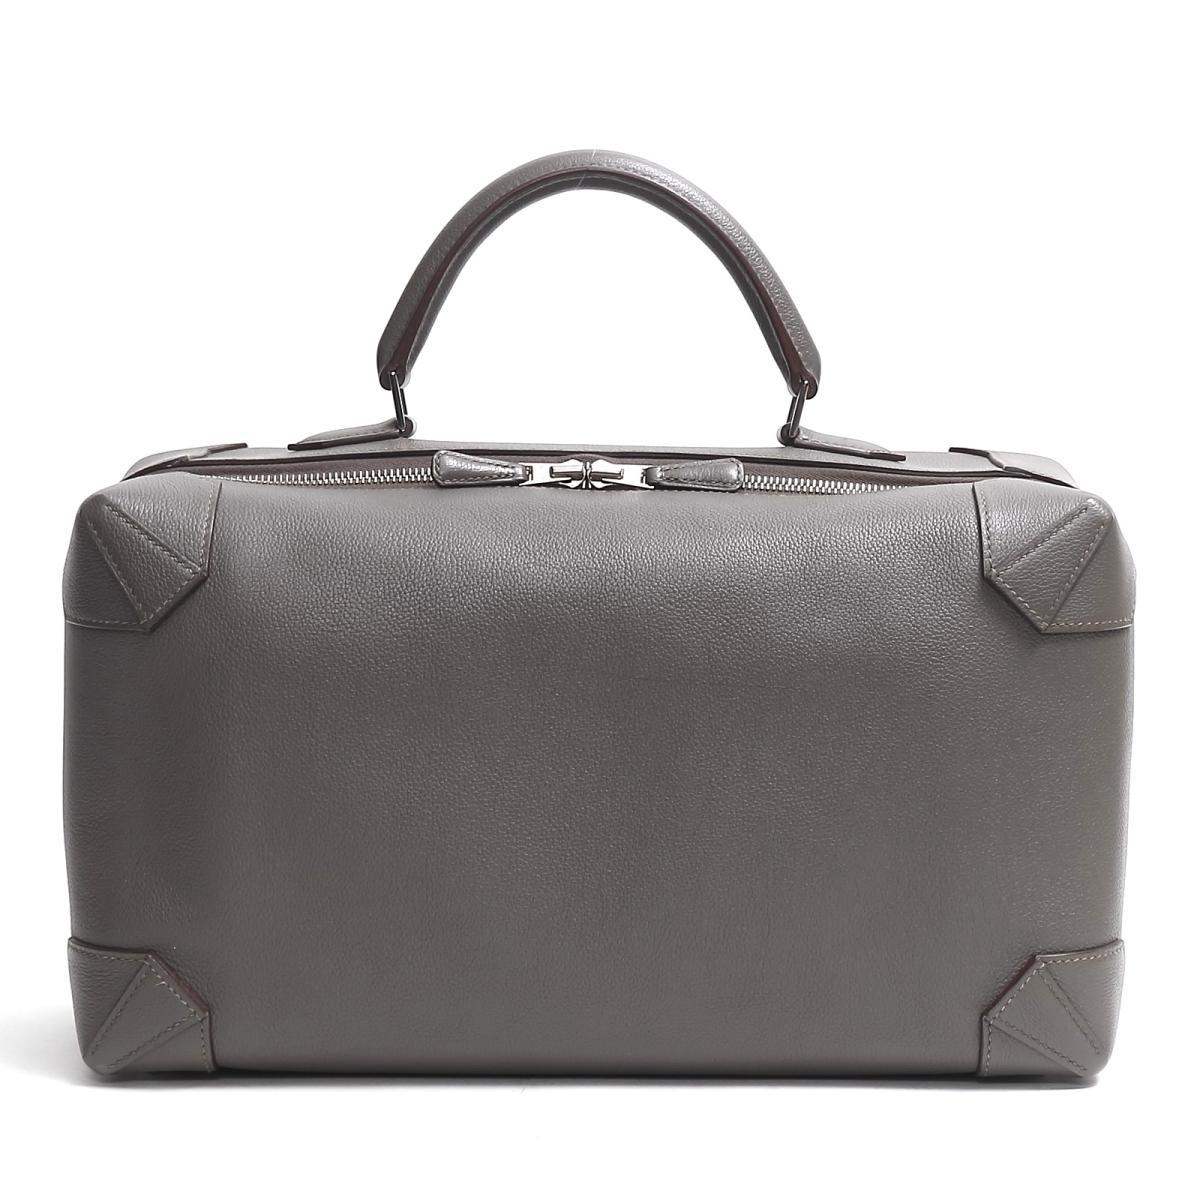 f924ca363ba4 Hermes maxi box 37 ハンドバッグバッグレディースヴォーエバーカラーエタン (metal fittings  silver)